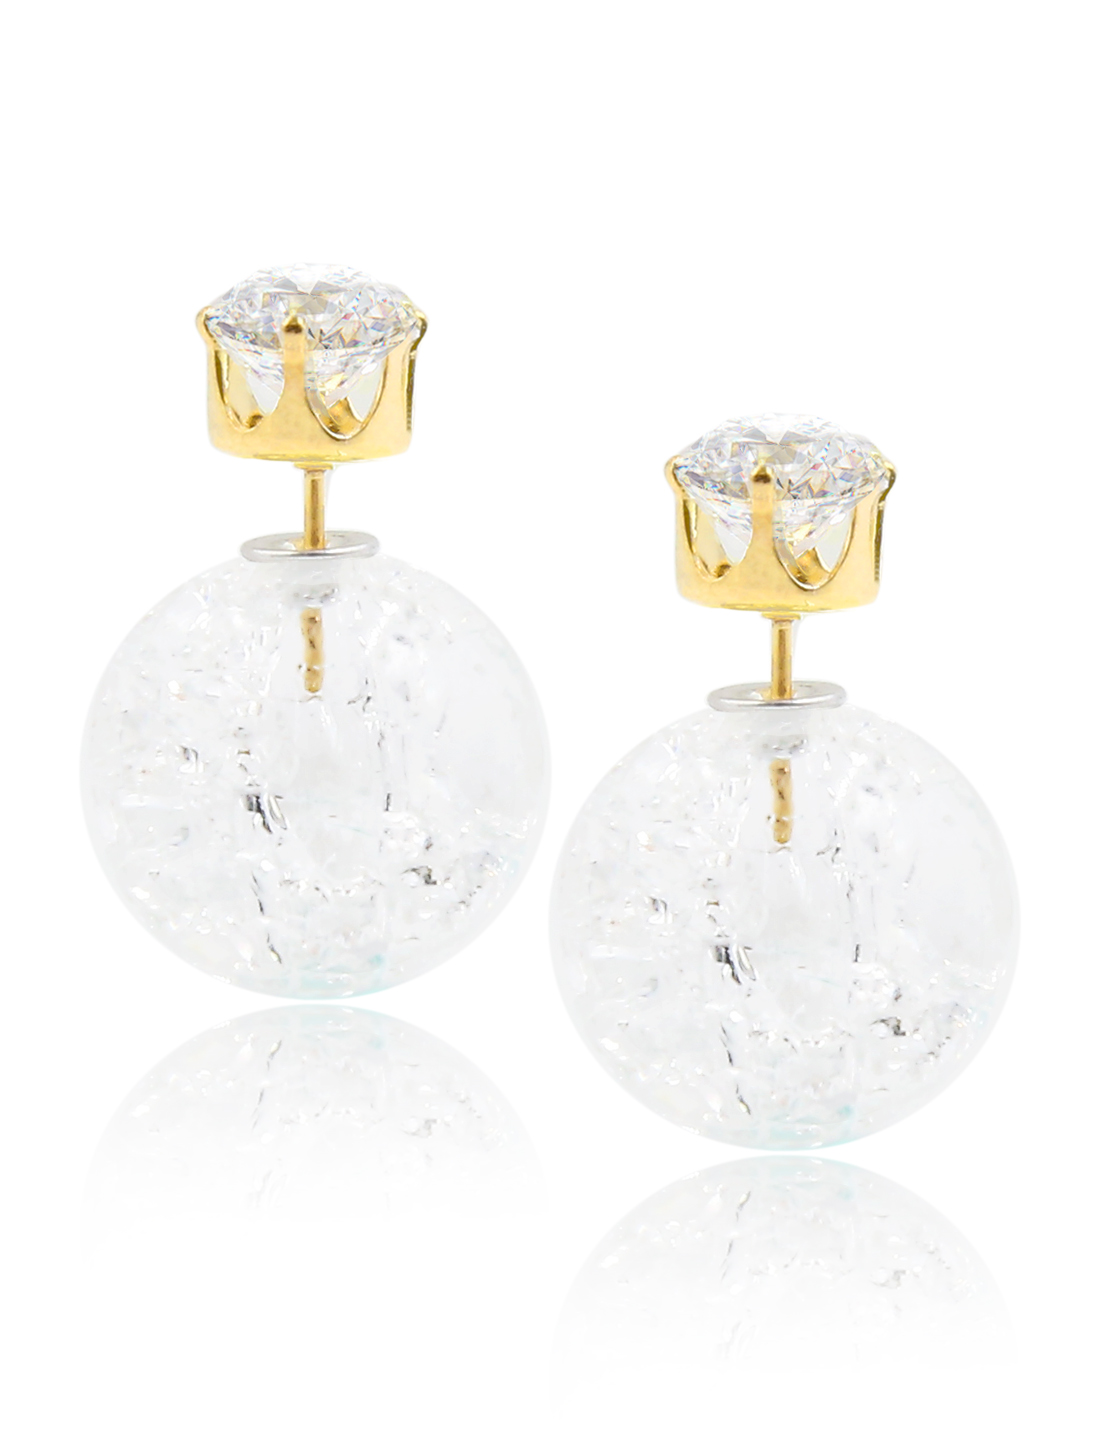 Fashion Women Elegant Double Sides Zircon Faux Crystal Ball Earrings Ear Stud 1 Pair White